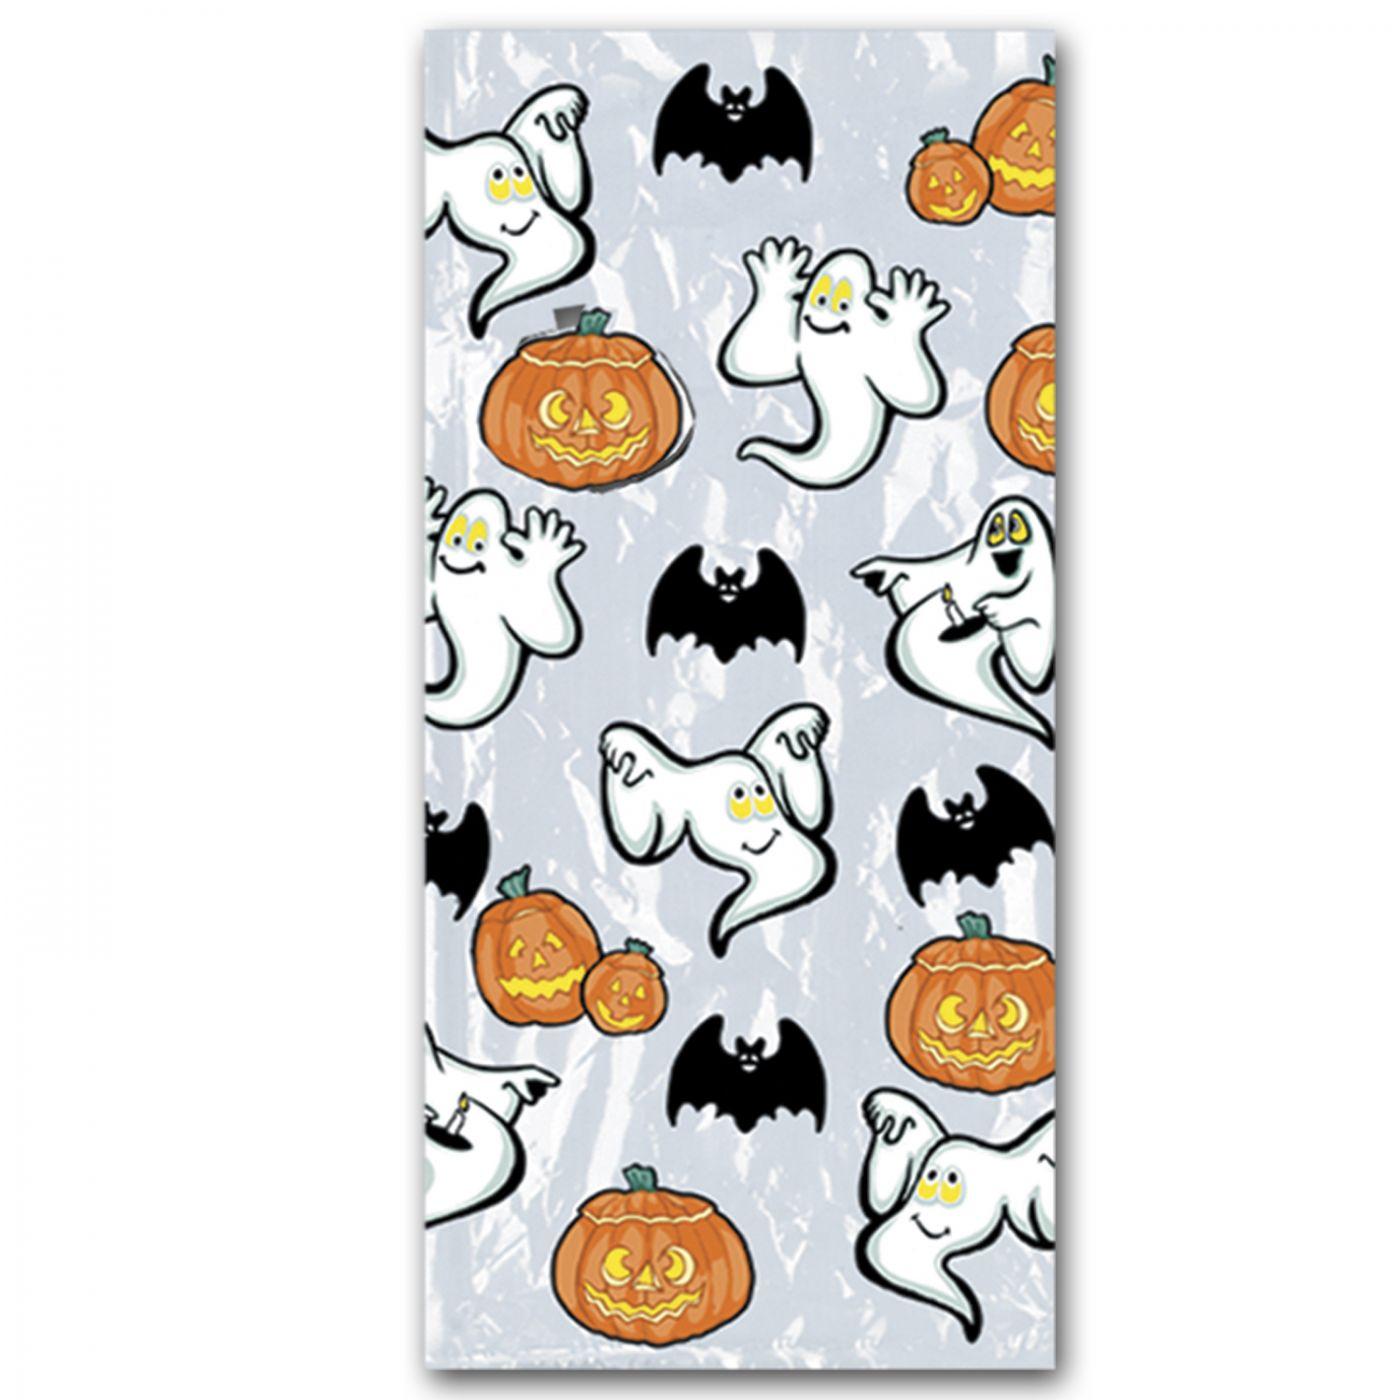 Pumpkin & Ghost Cello Bags image